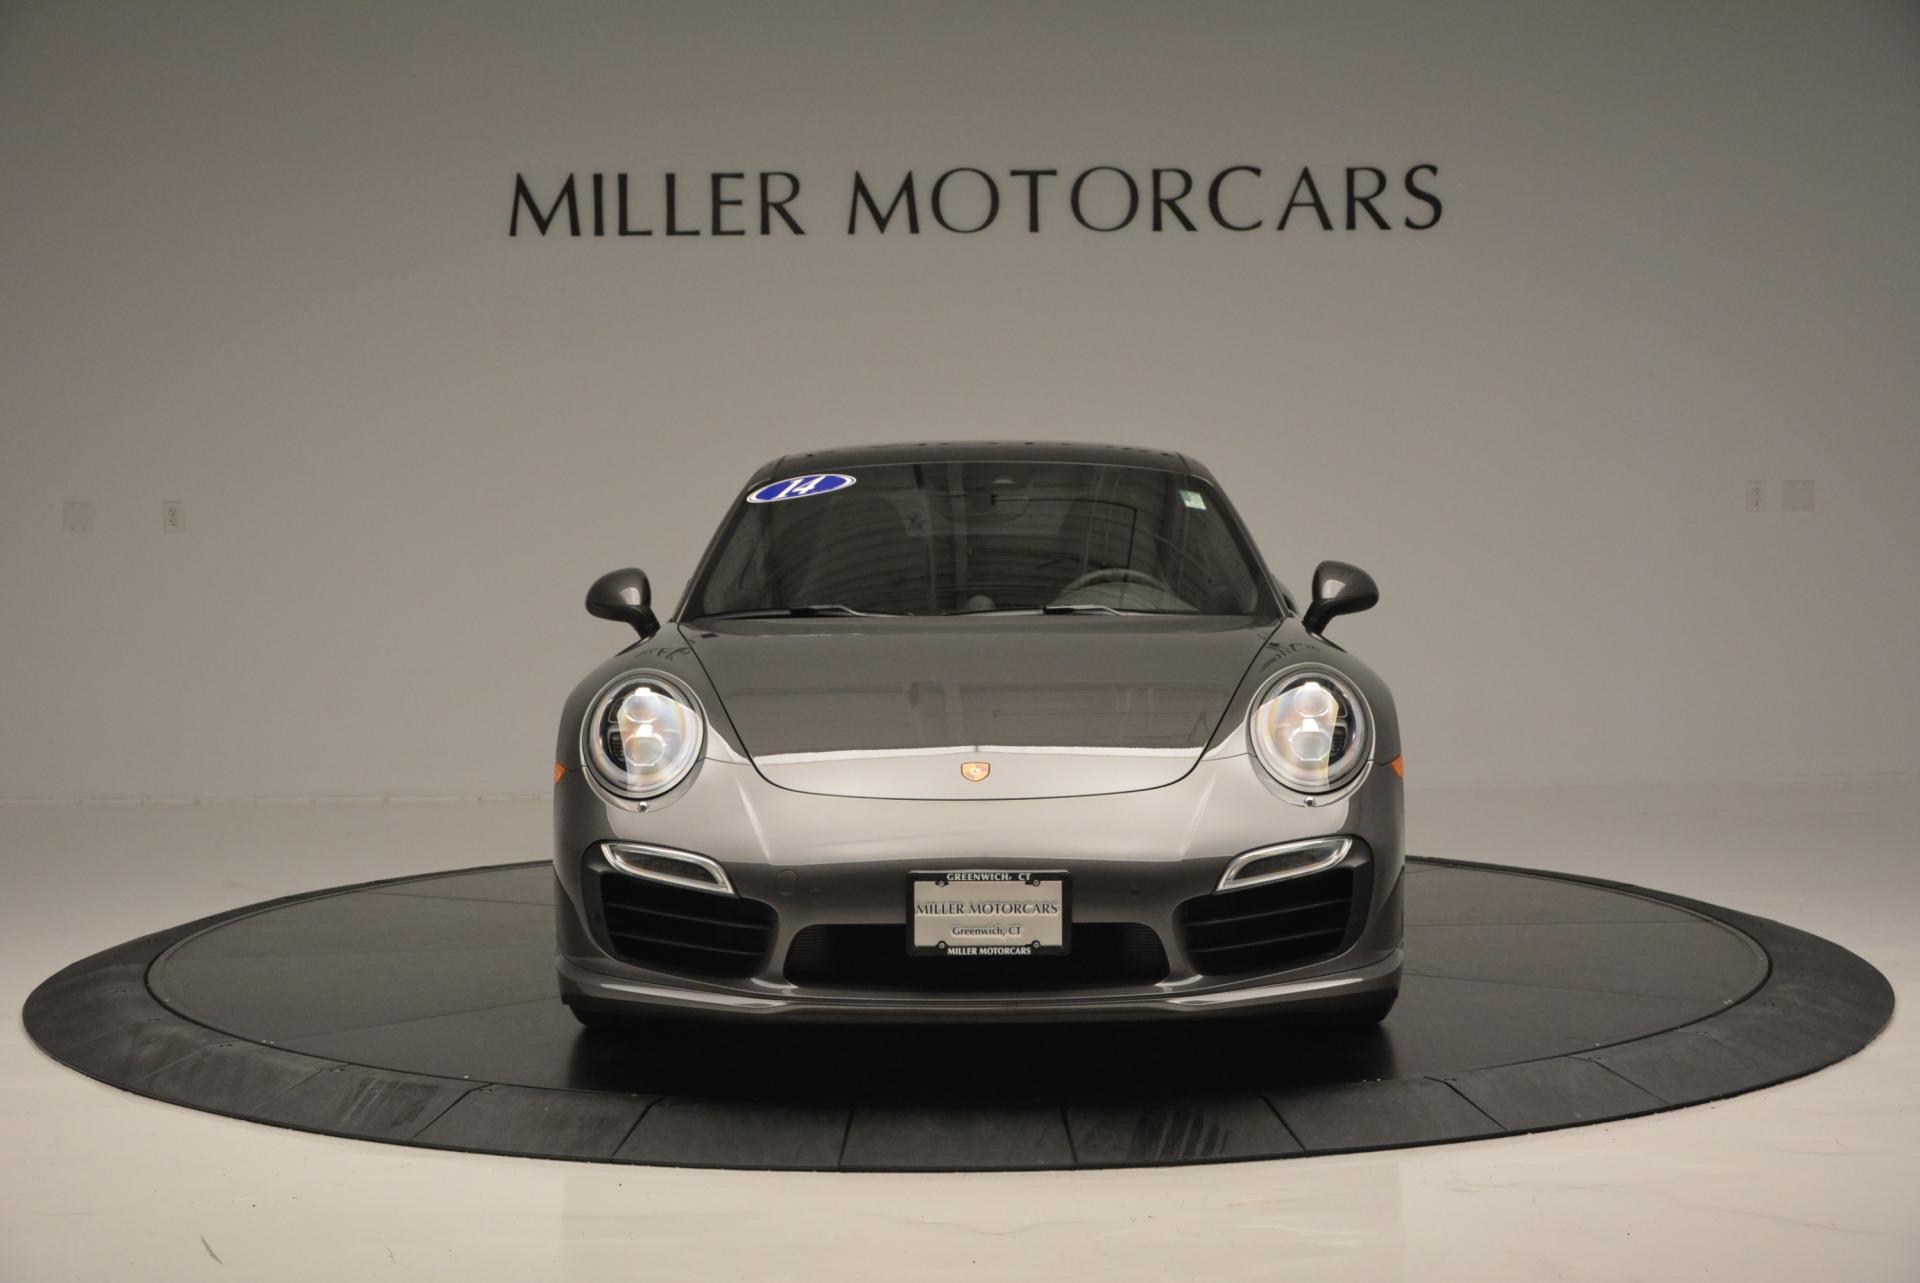 Used 2014 Porsche 911 Turbo S For Sale In Greenwich, CT 113_p11